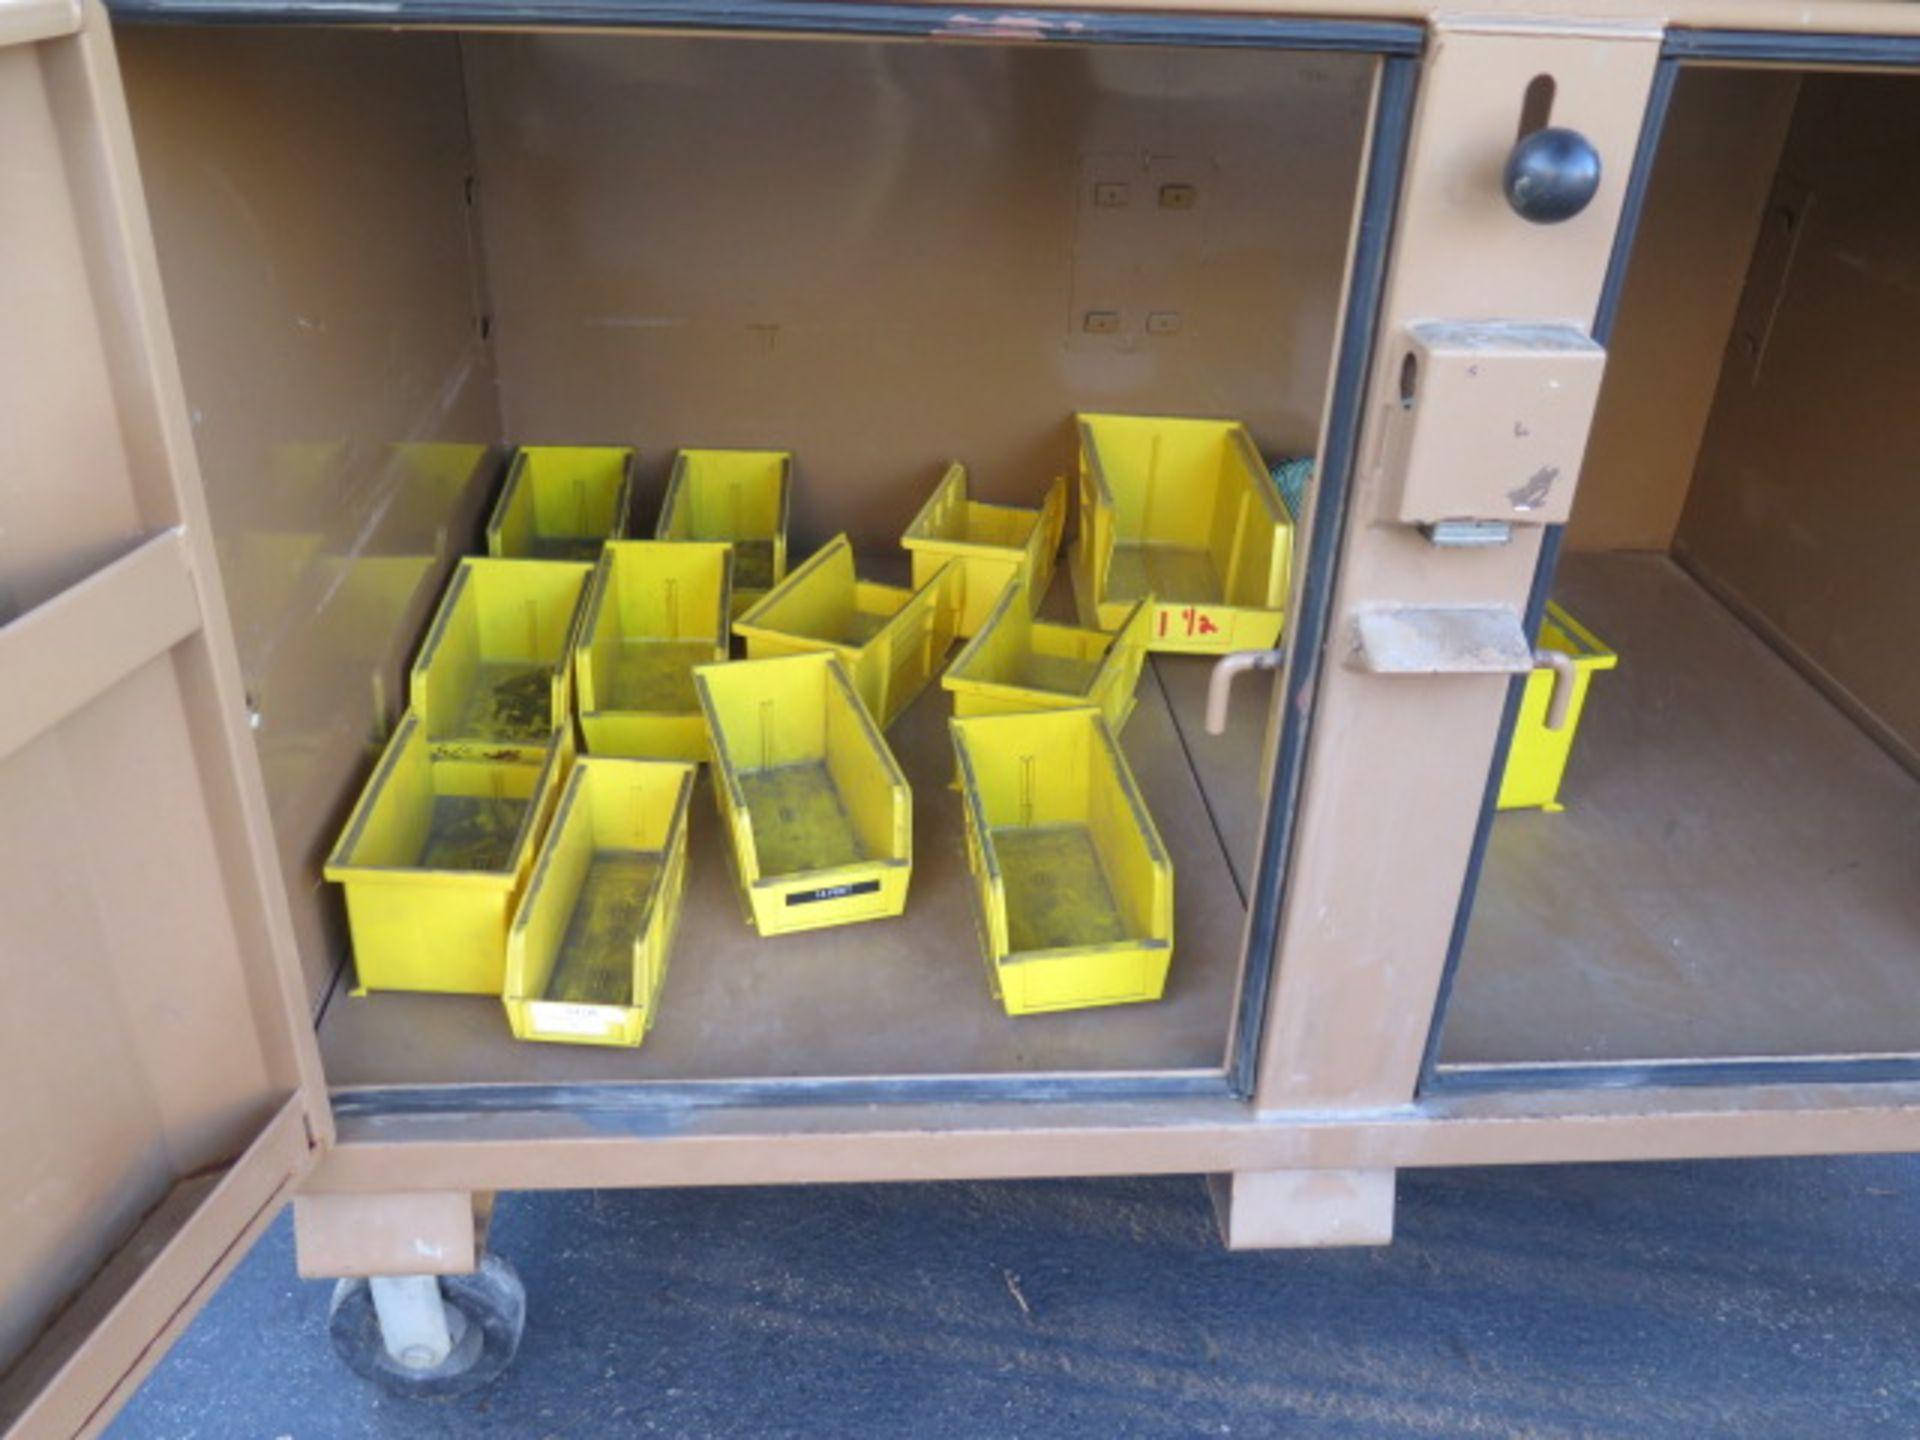 Knaack mdl. 119-01 Rolling Job Box (SOLD AS-IS - NO WARRANTY) - Image 6 of 7